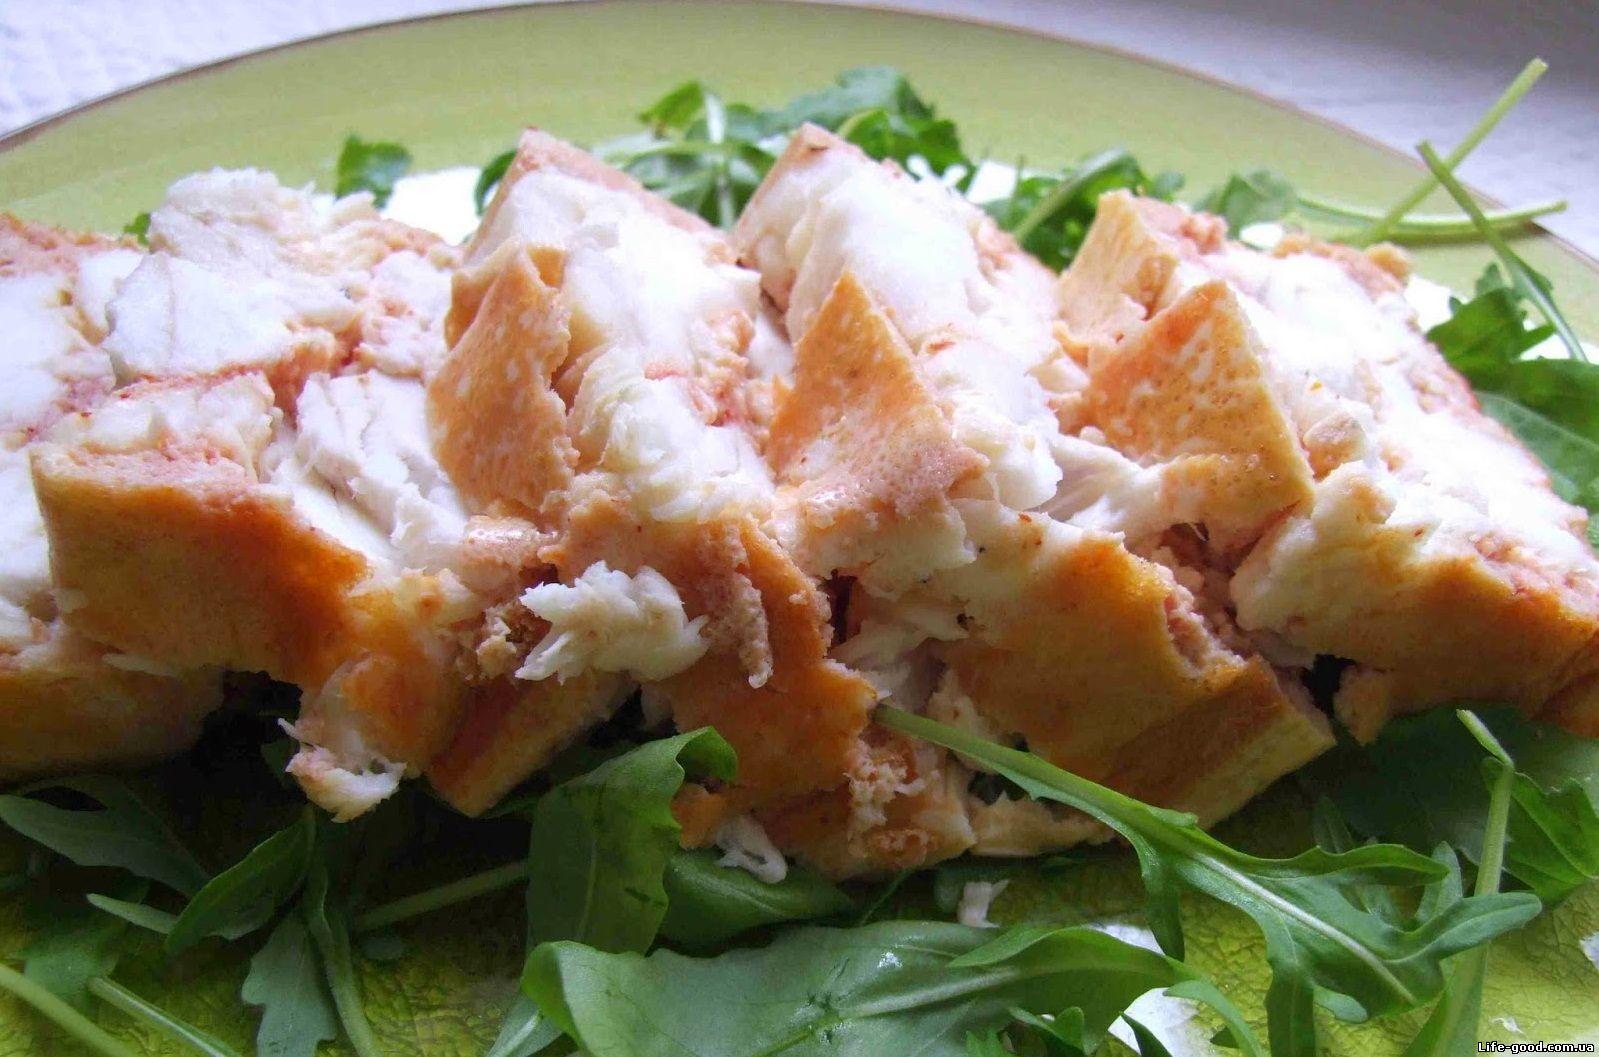 Блюда из налима - рецепты с фото на Повар.ру (16 рецептов налима)